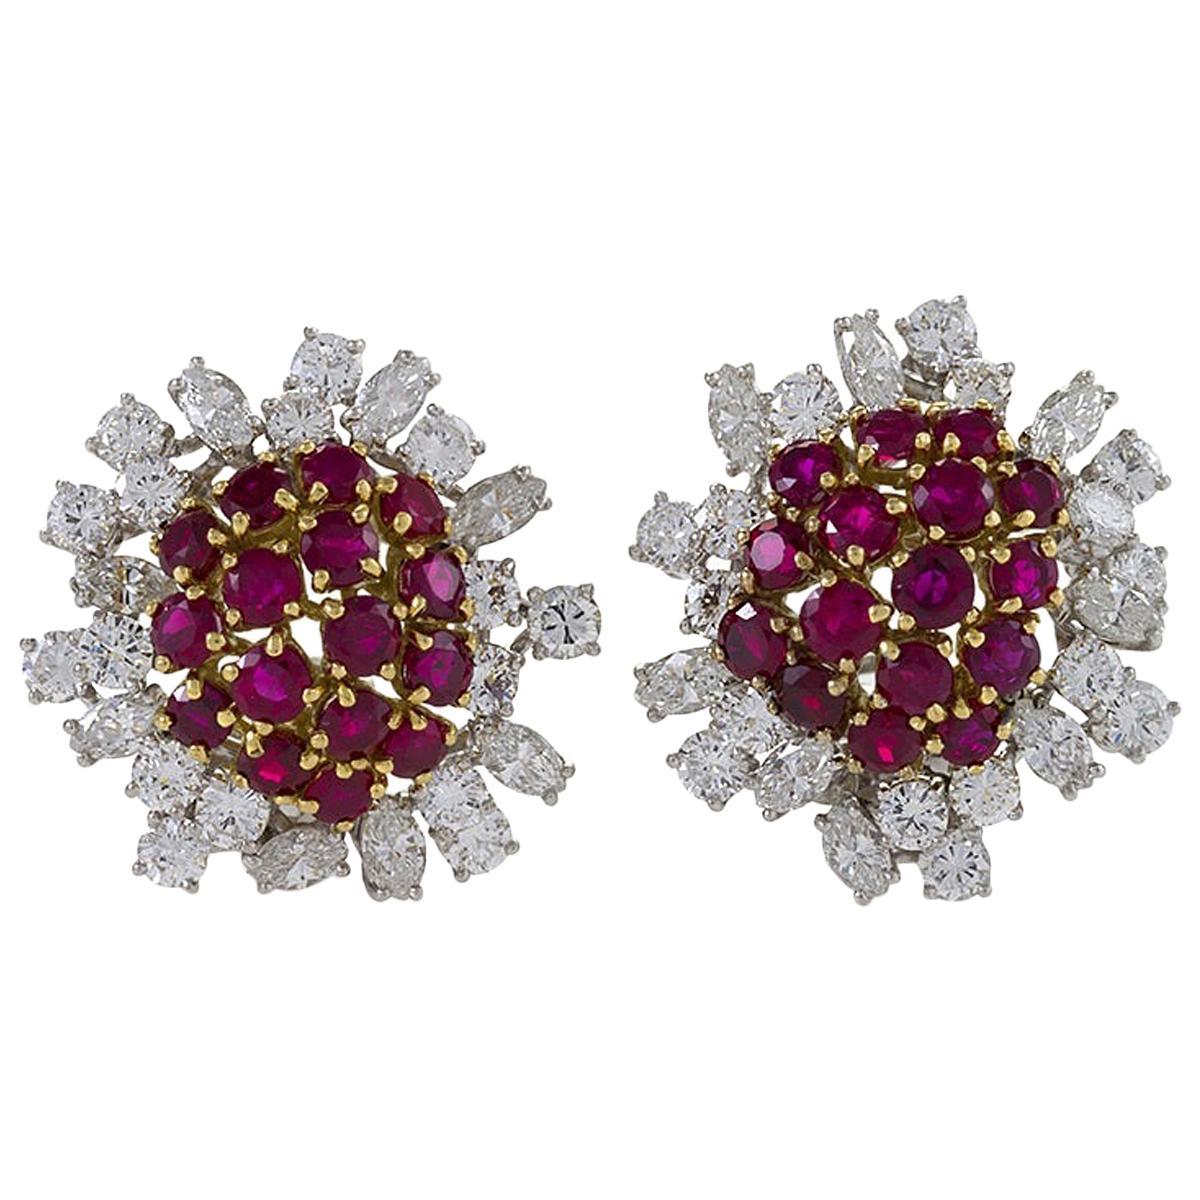 Boucheron Ruby and Diamond Earrings